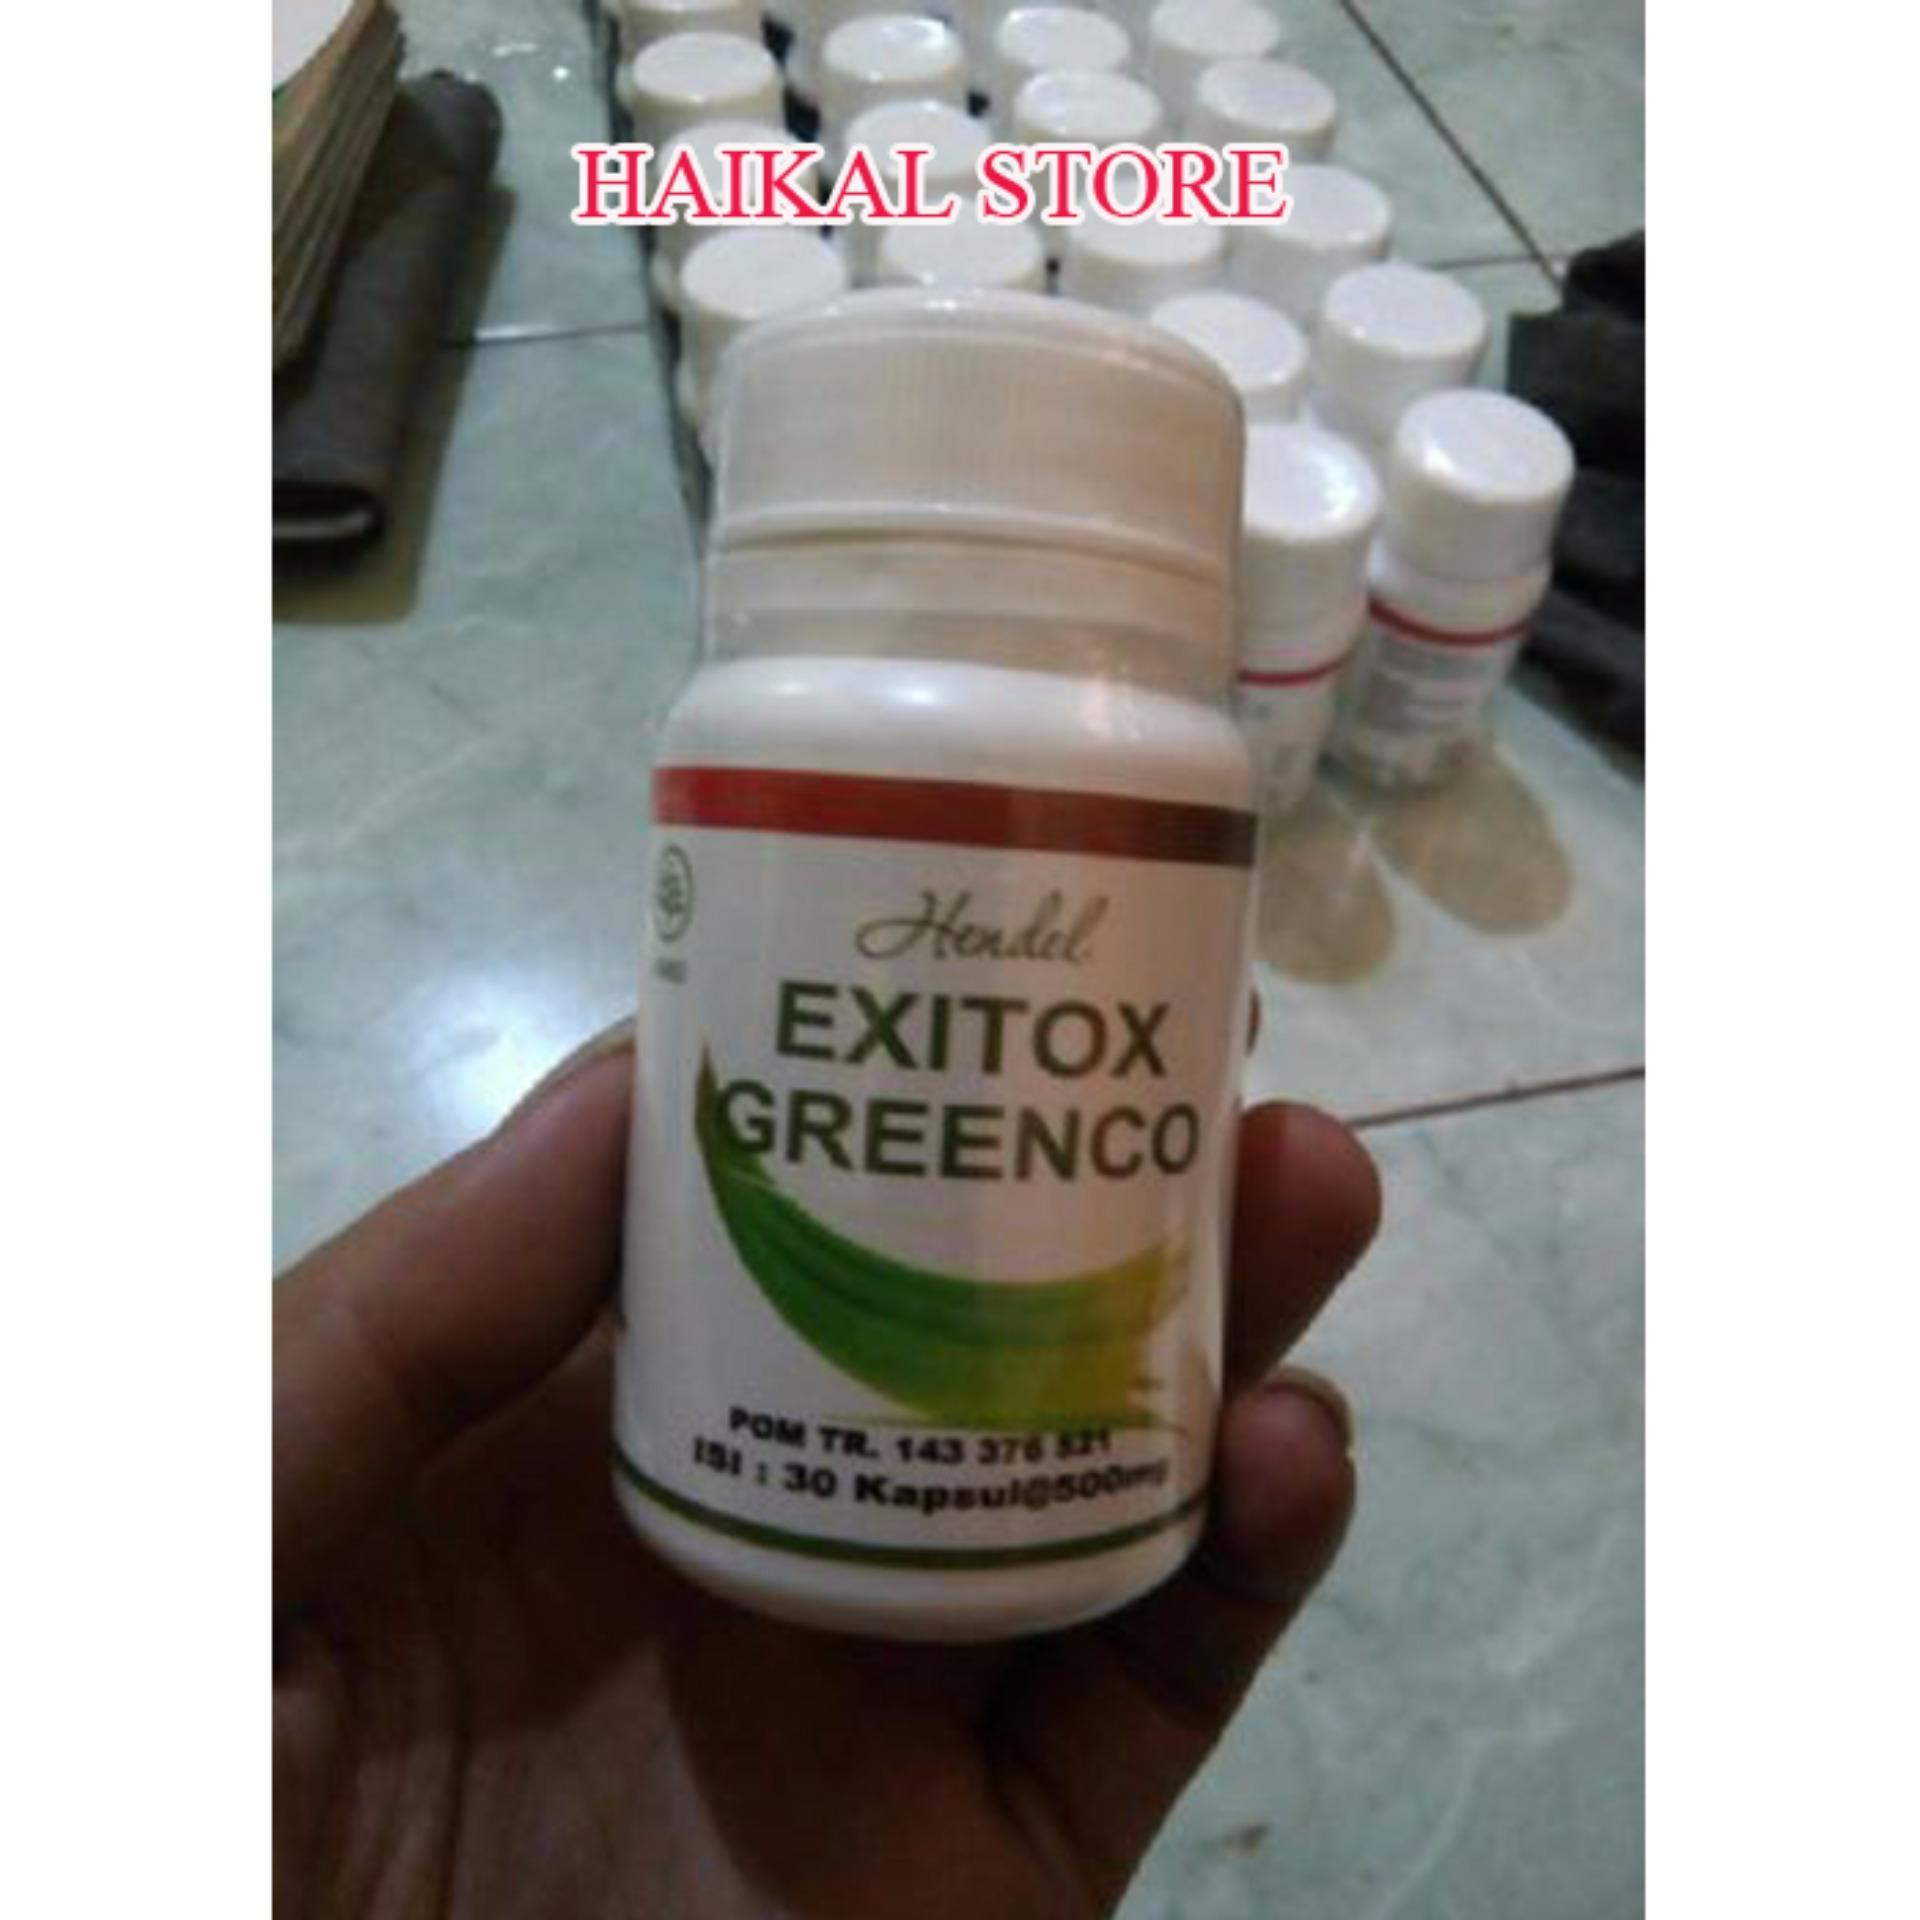 HENDEL EXITOX GREENCO GREEN COFFEE BEAN EXTRACT PELANGSING BADAN RESMI BPOM